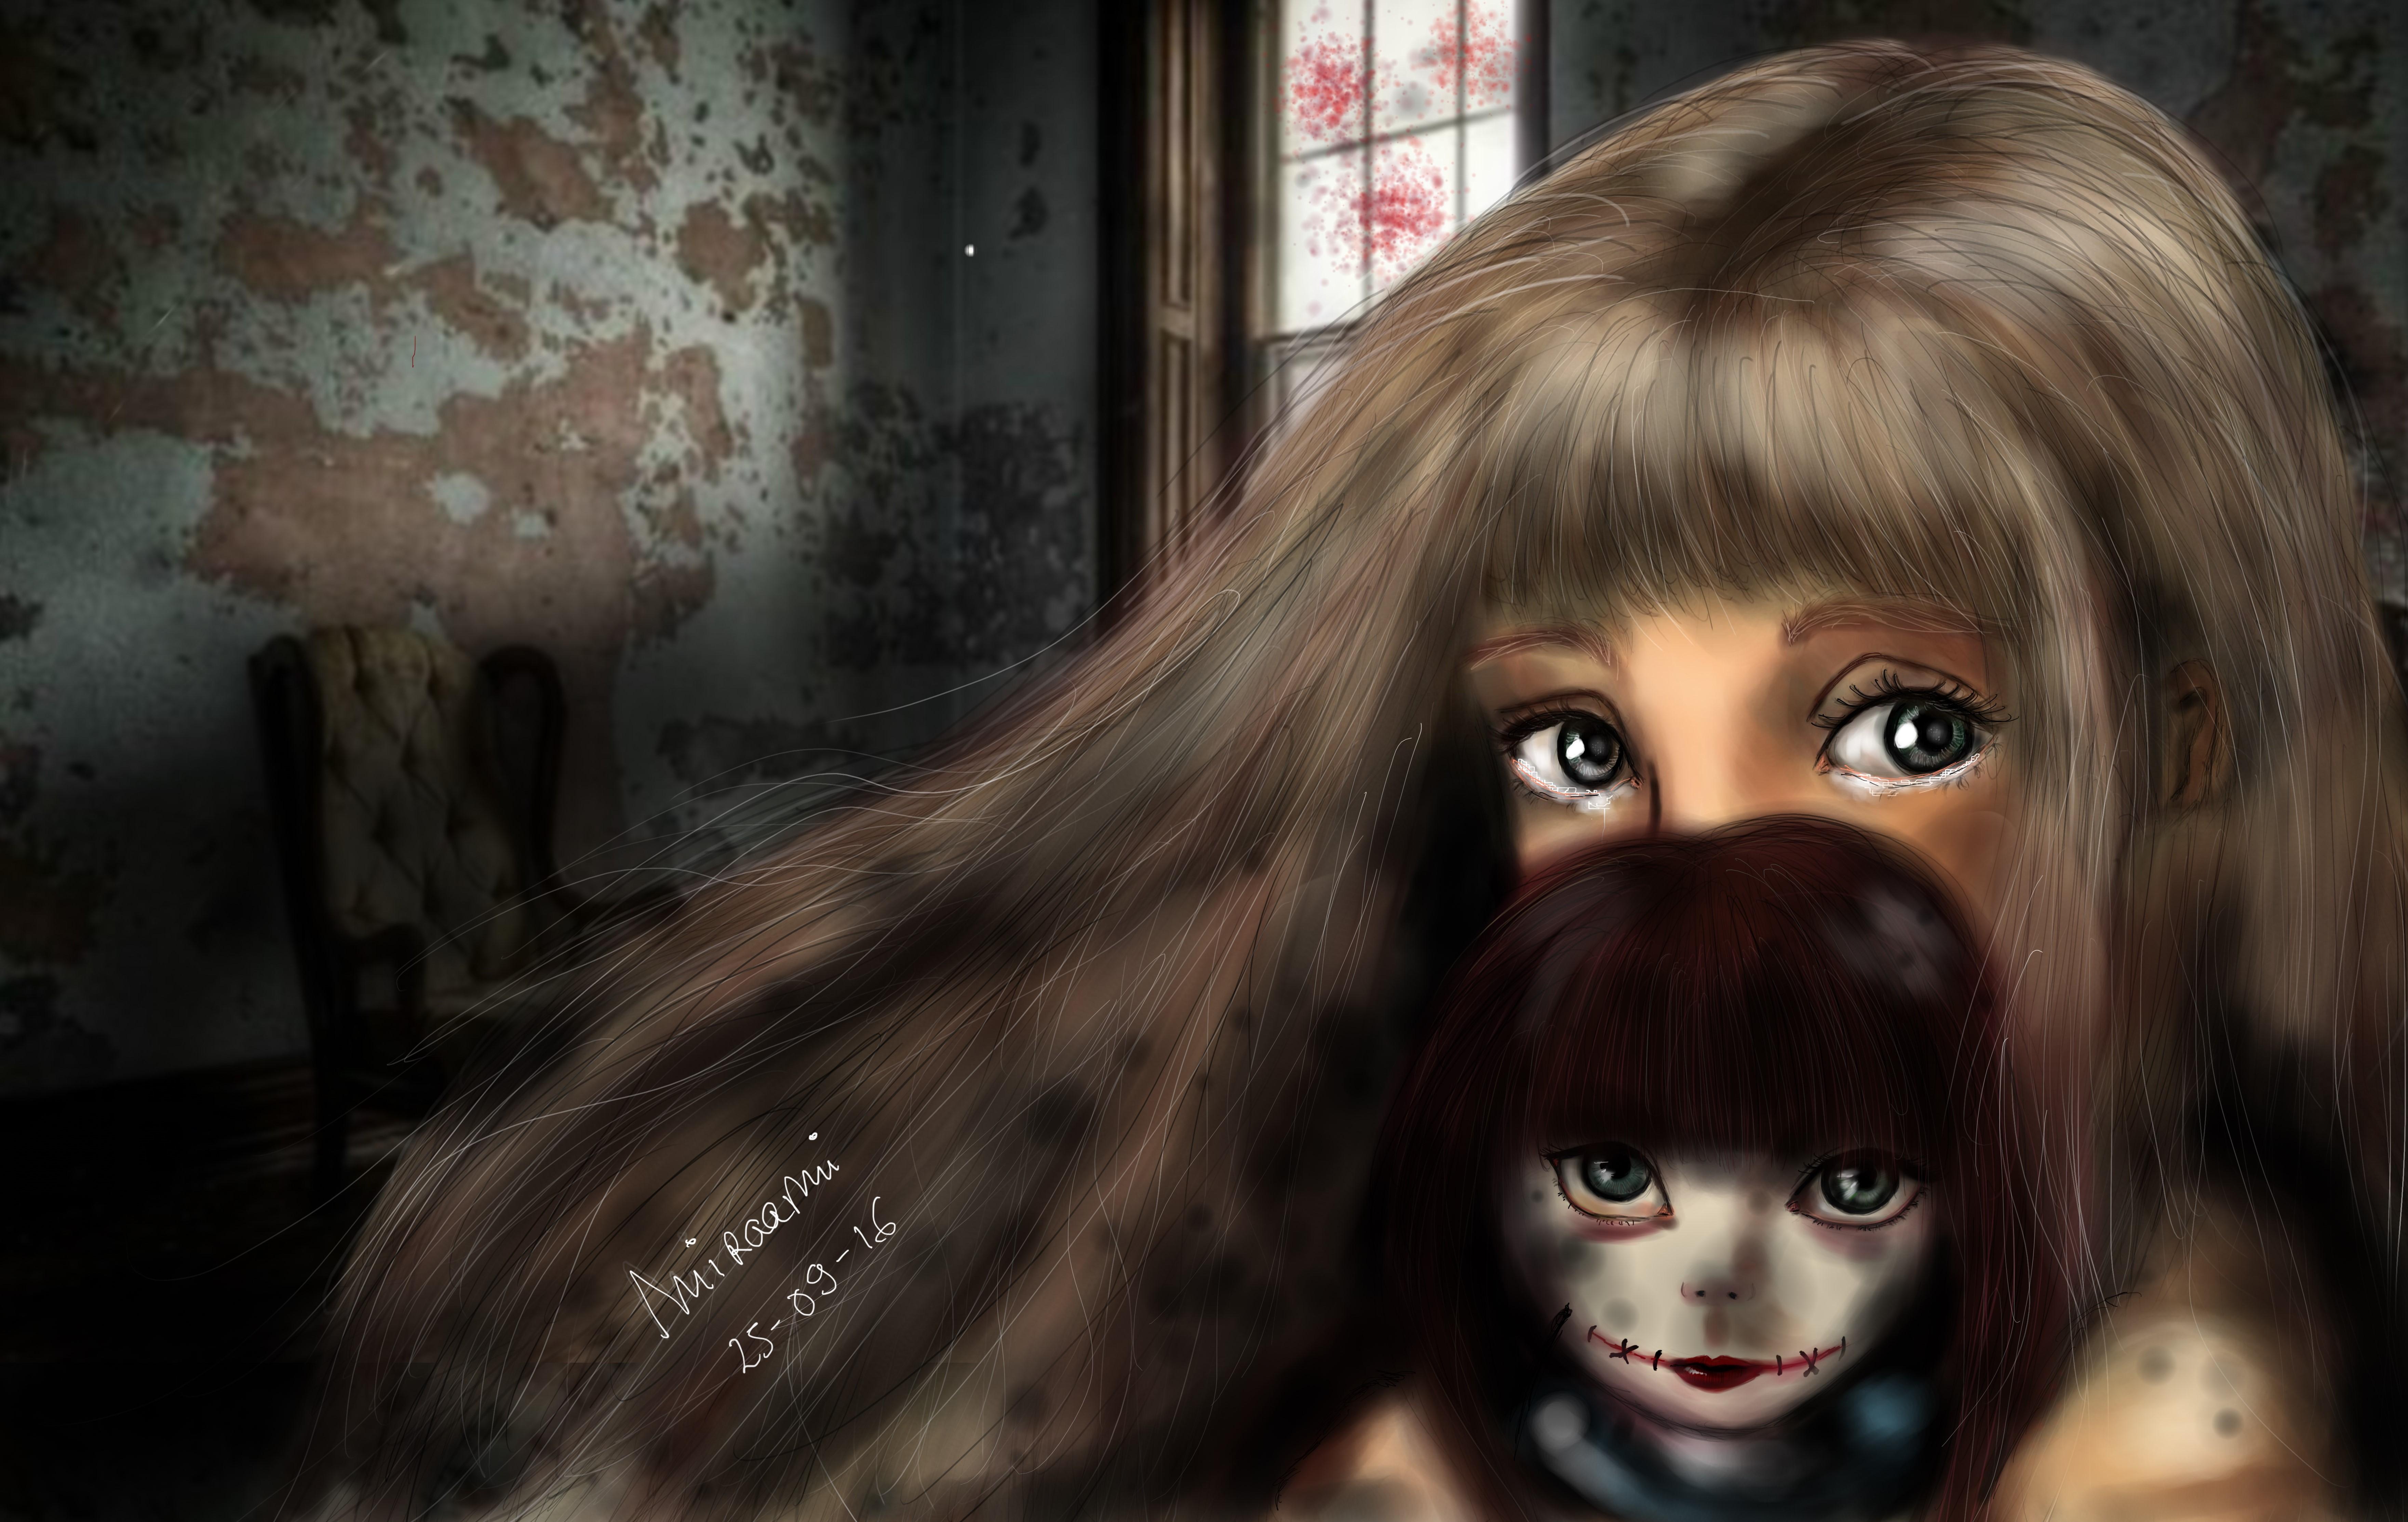 Dessin The doll de Miraami